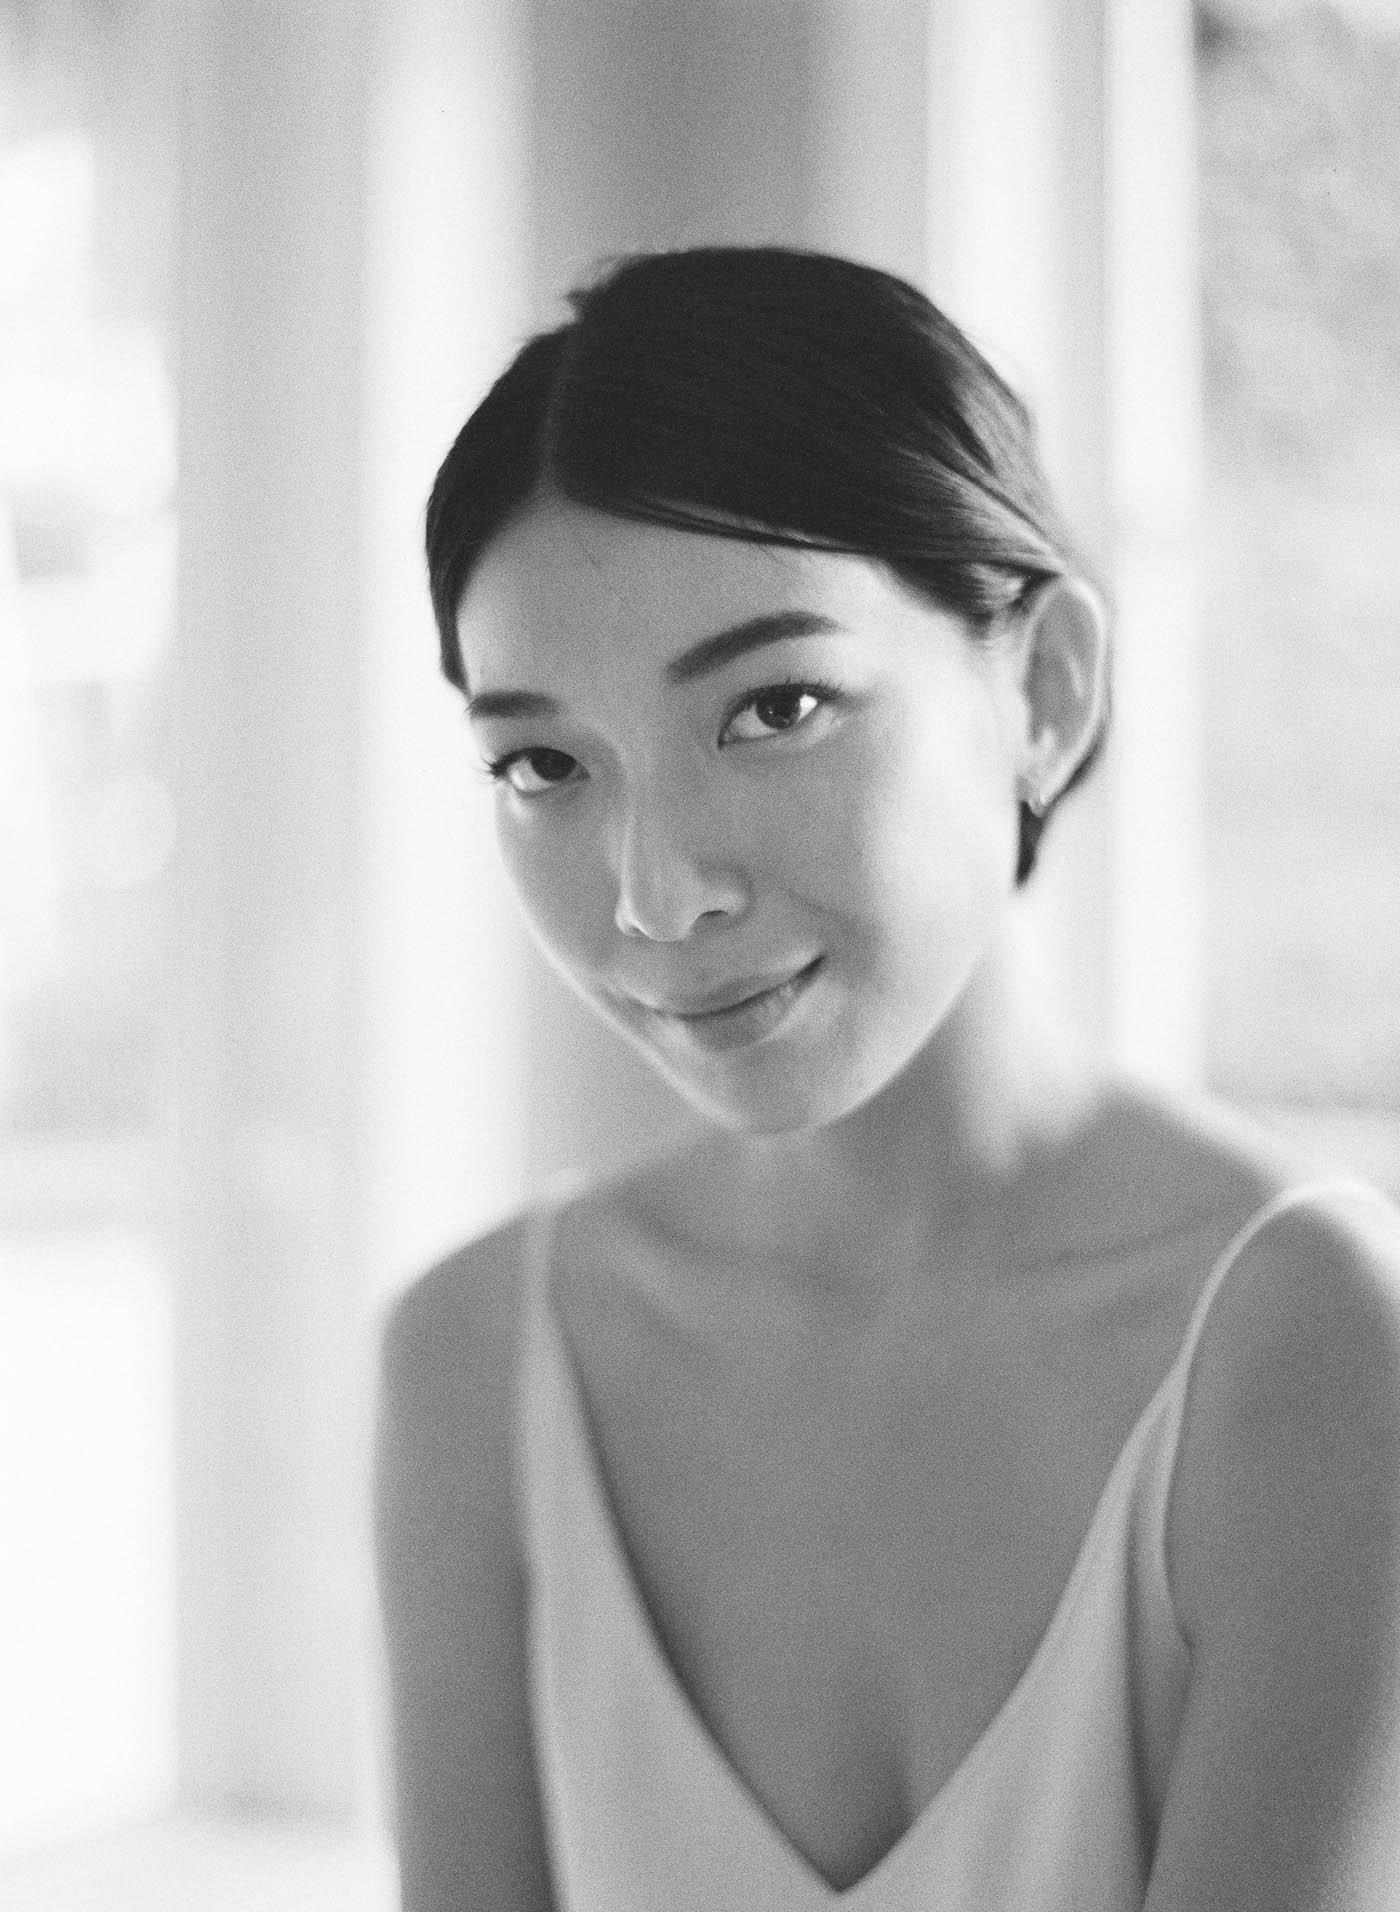 riviera-house-engagement-101-Jen_Huang-Tea-Ceremony-351-Jen_Huang-000006620006.jpg